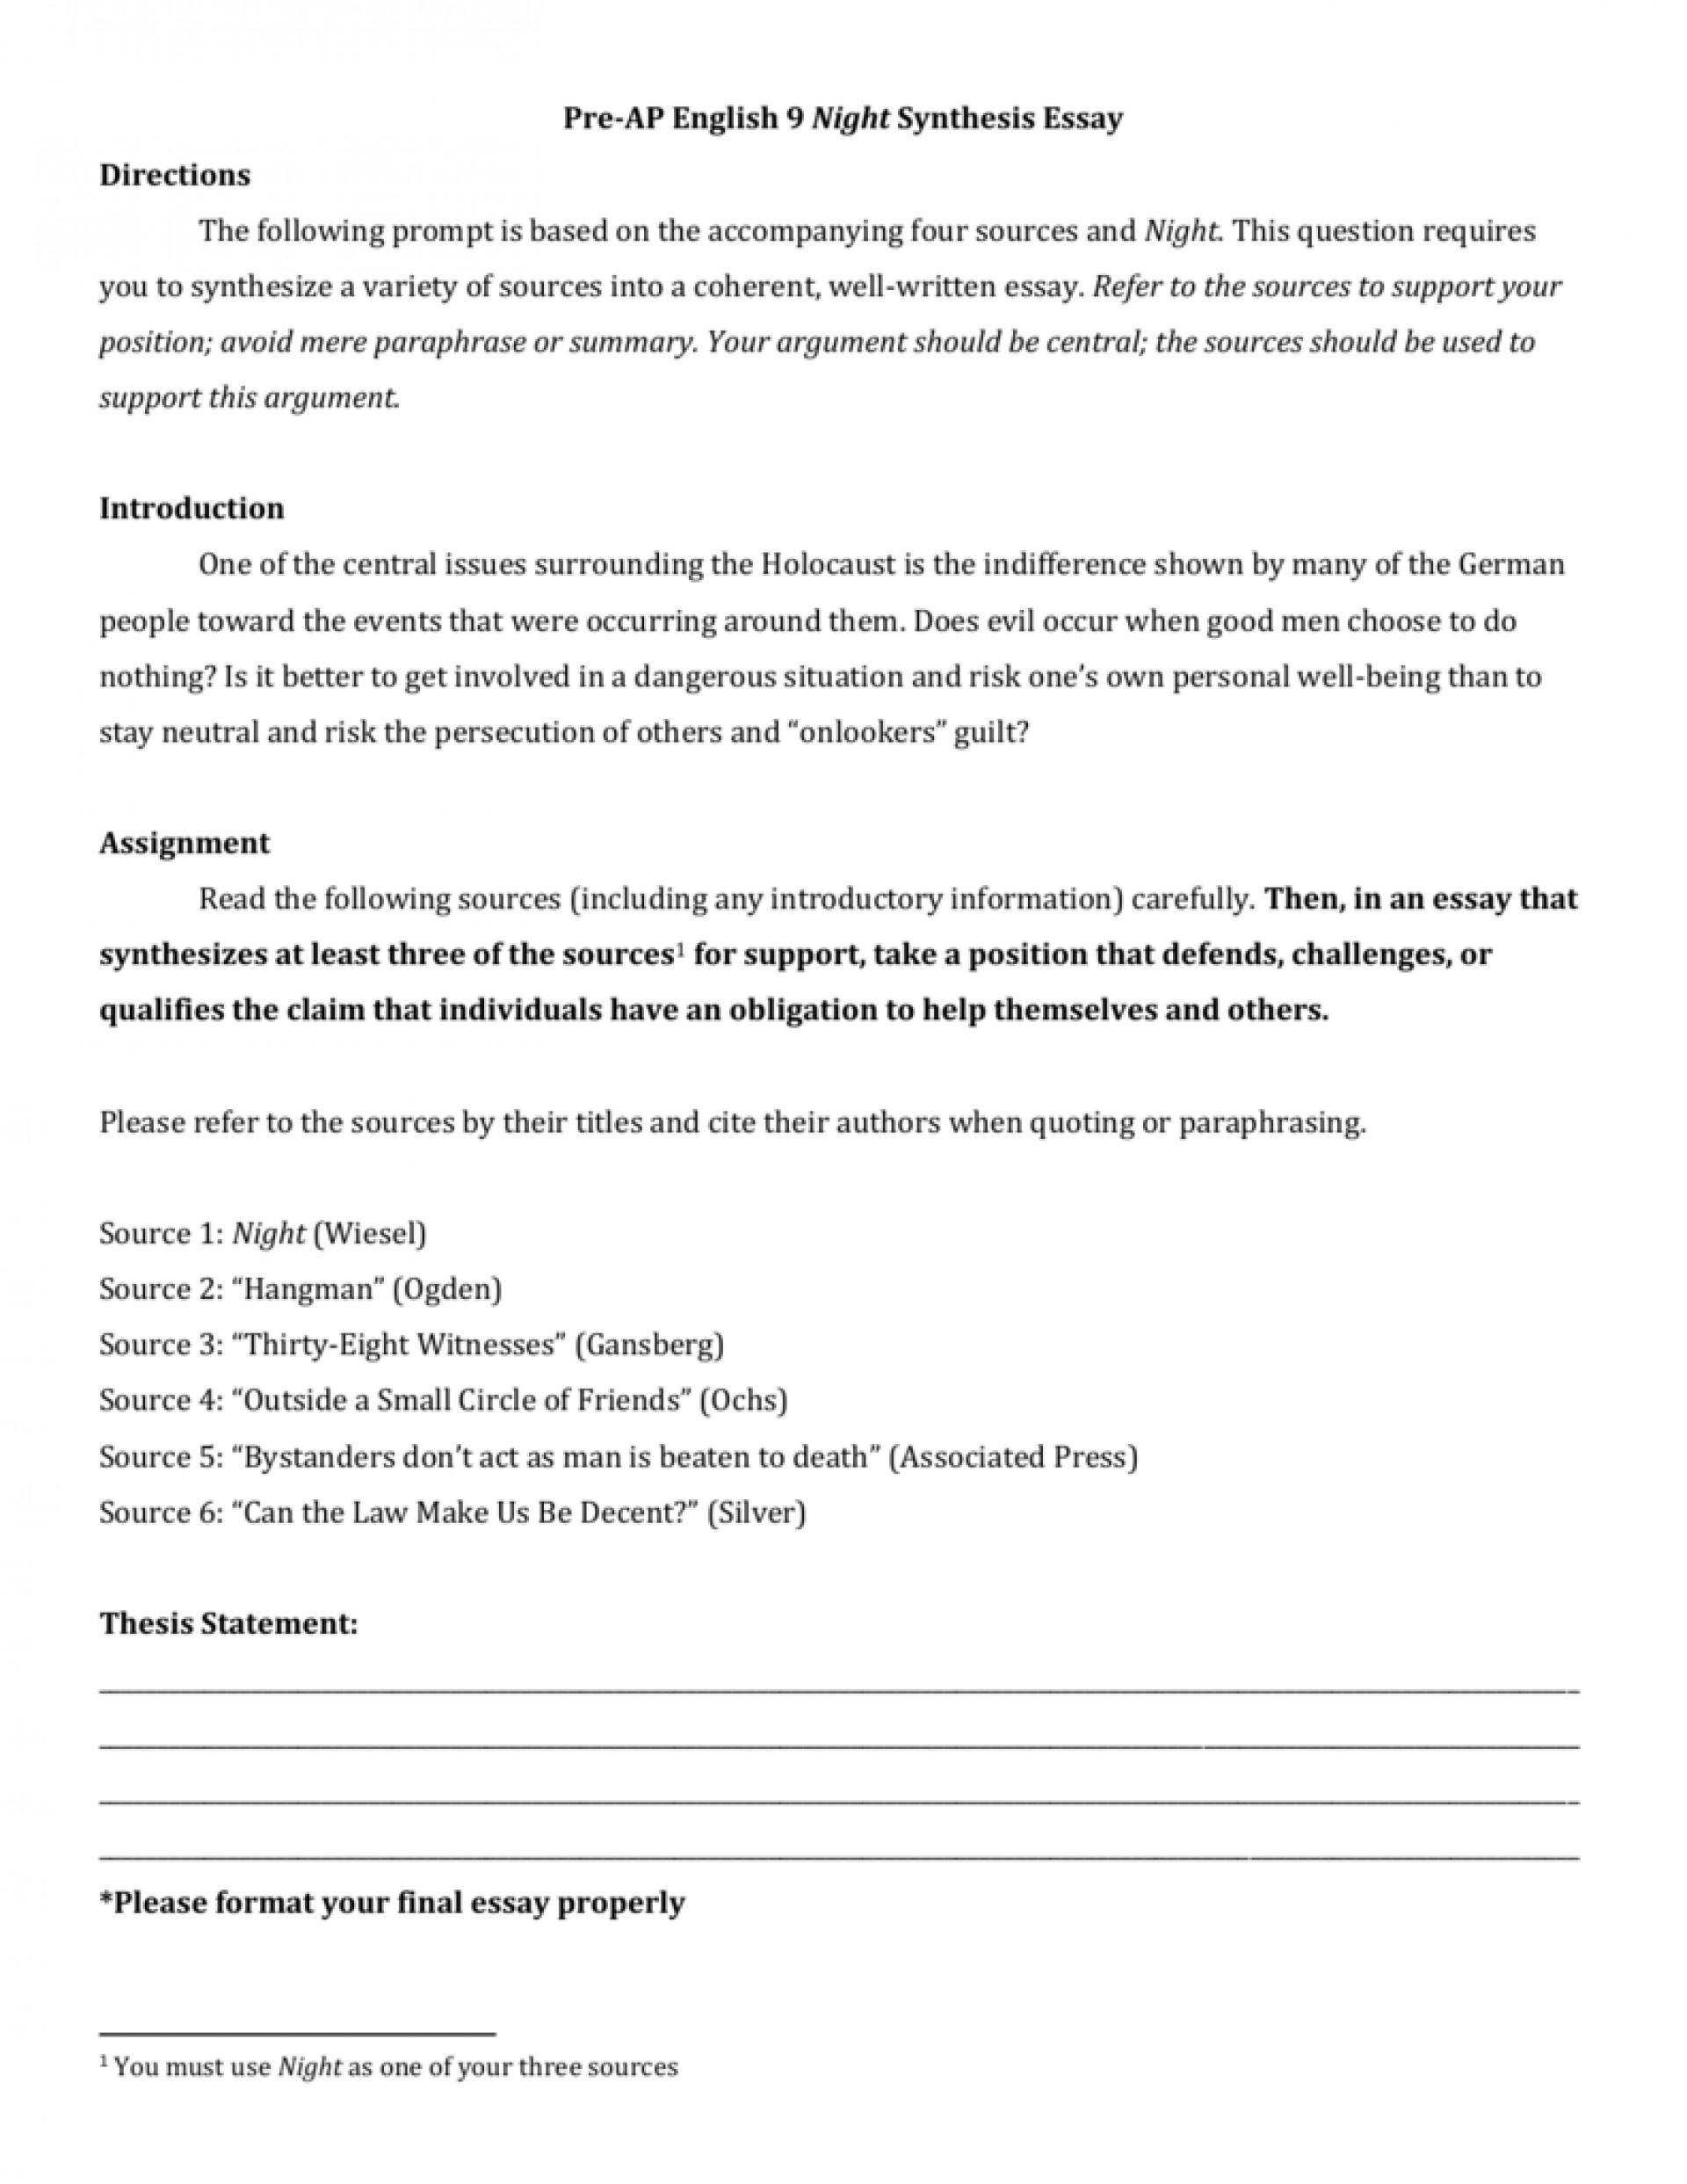 003 006963363 1 Synthesis Essay Sensational Outline Format Ap Lang 1920